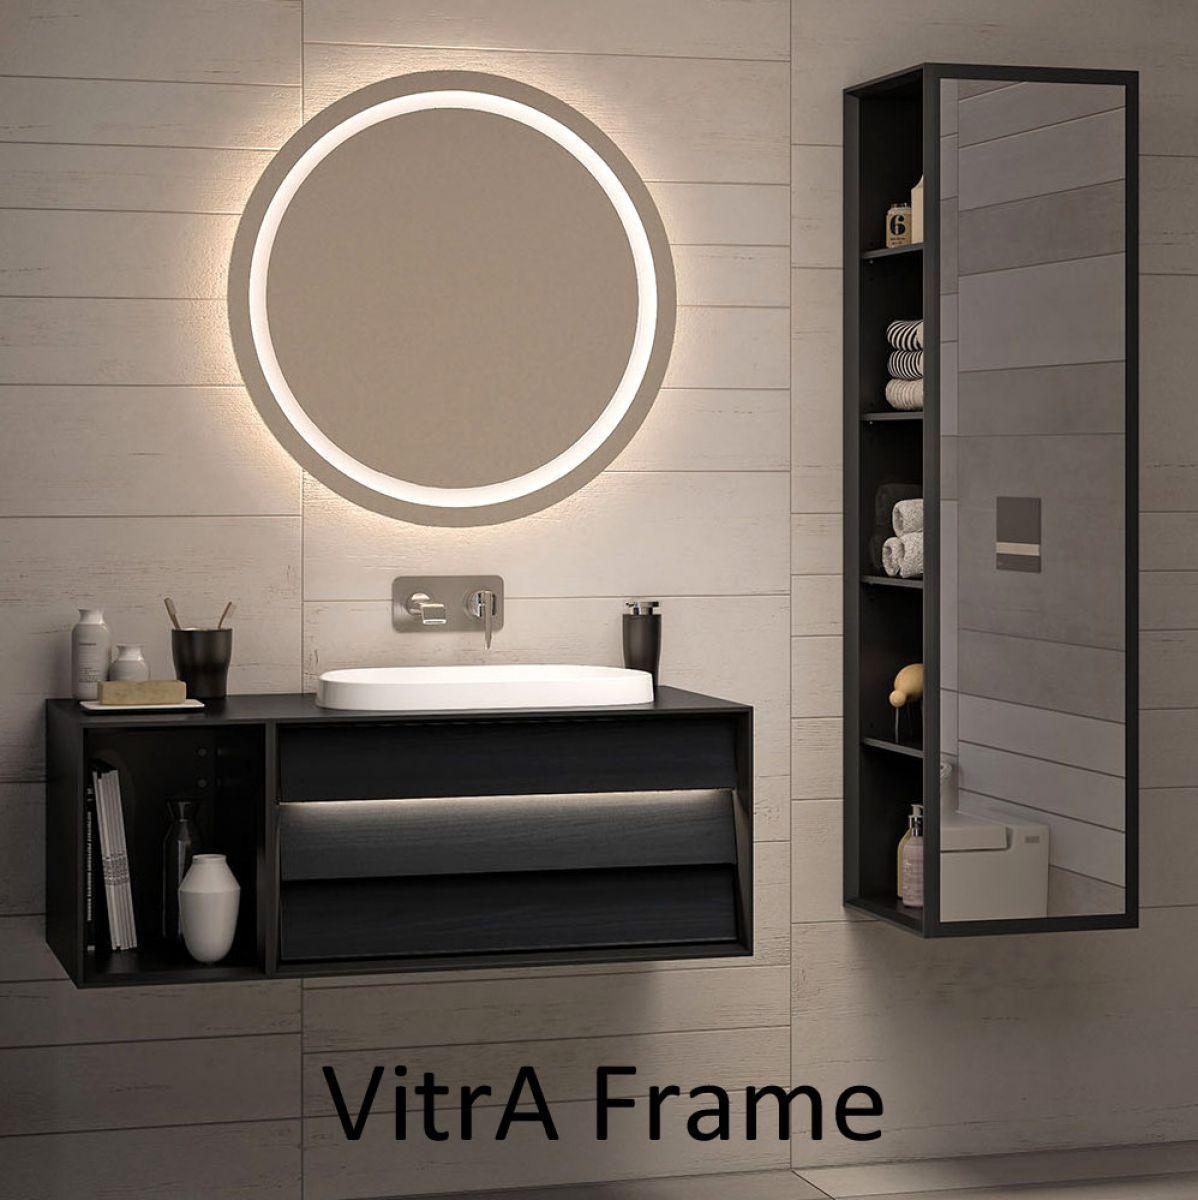 Vitra Frame Large 80cm Round Led Mirror Led Mirror Bathroom Decor Bathroom Mirror